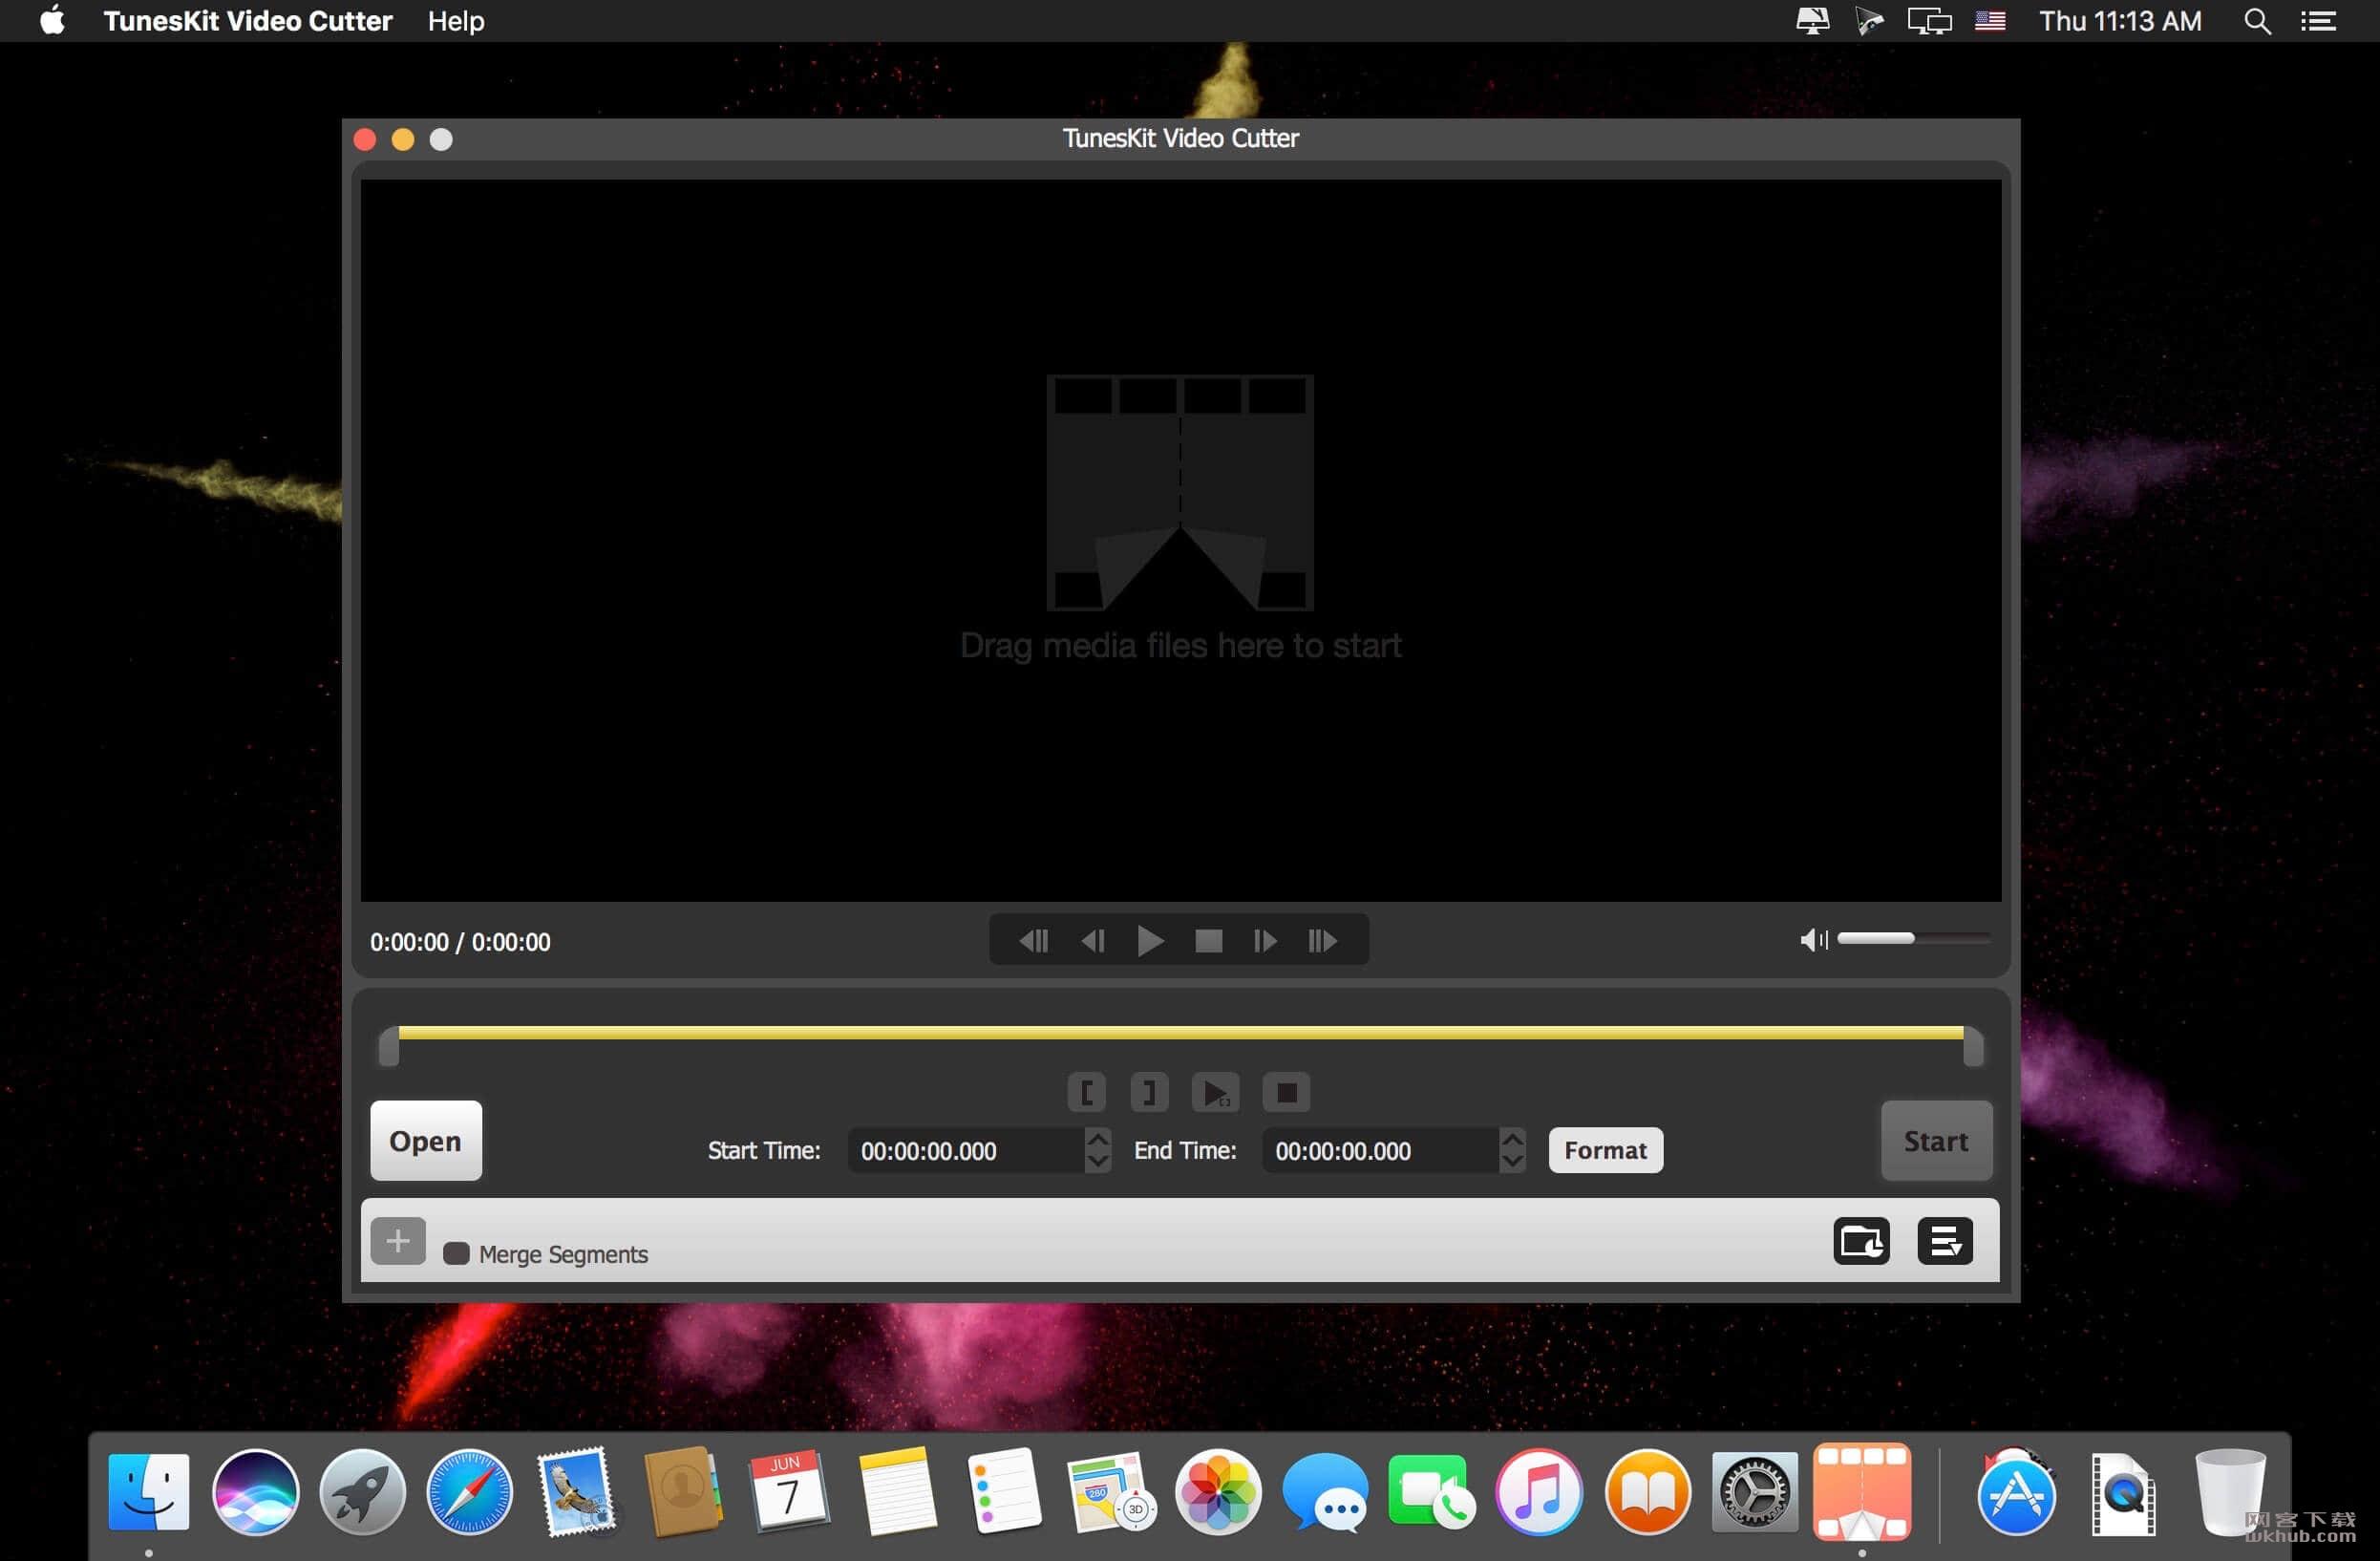 TunesKit Video Cutter 2.2.0.42 简单易用的视频切割软件